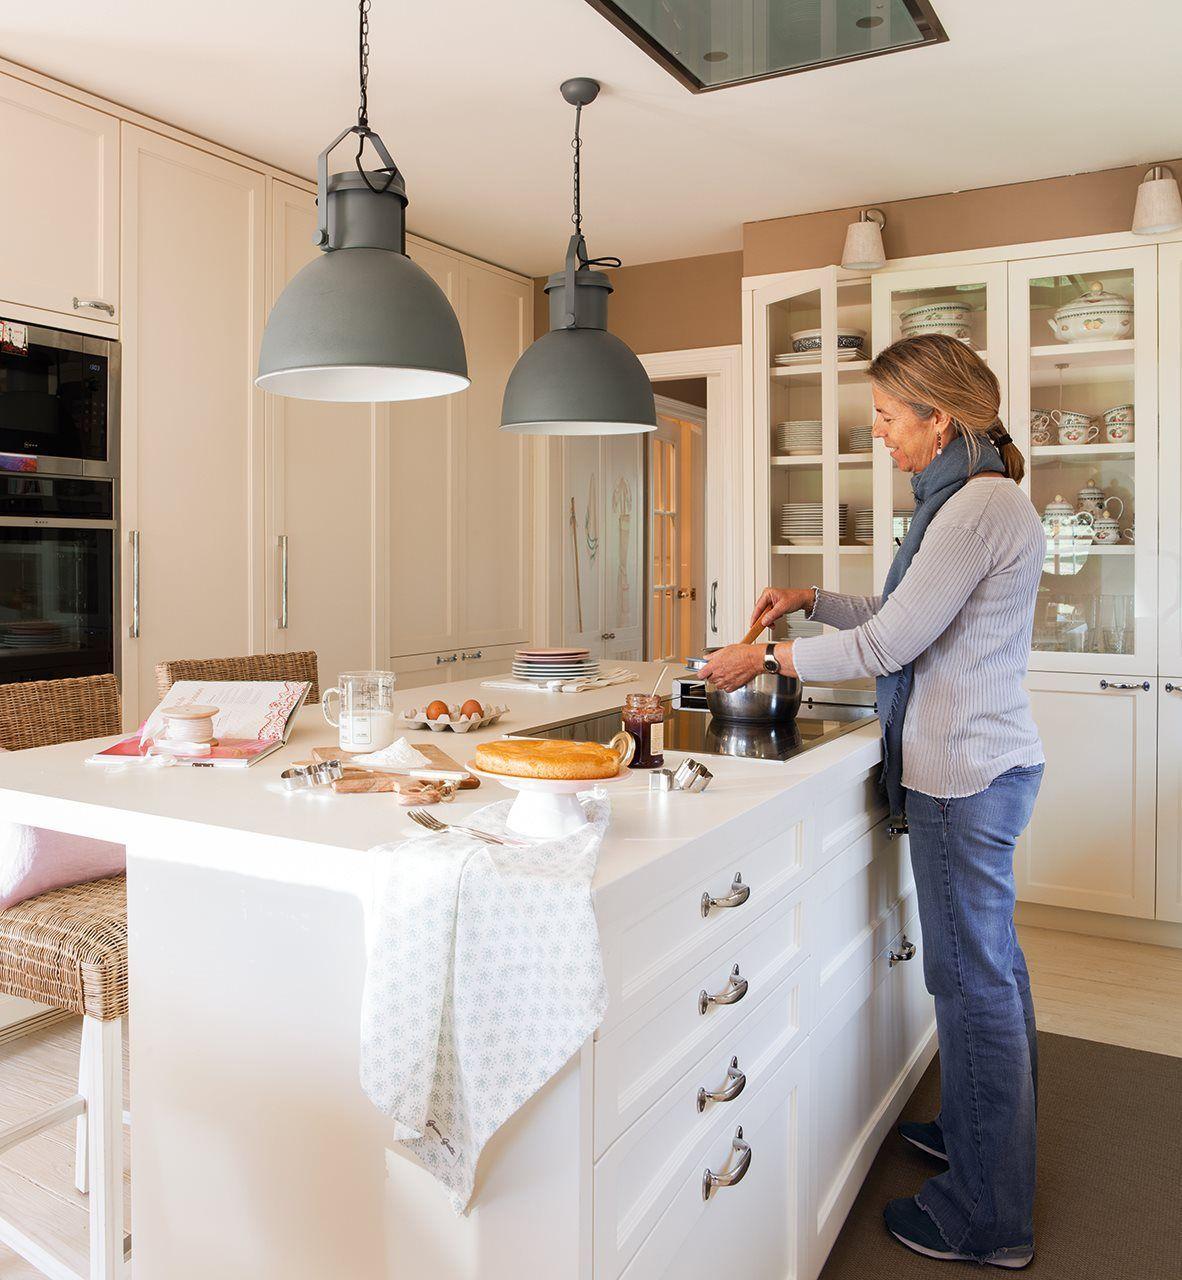 Una casa de inspiración estadounidense   Cocinas   Pinterest ...